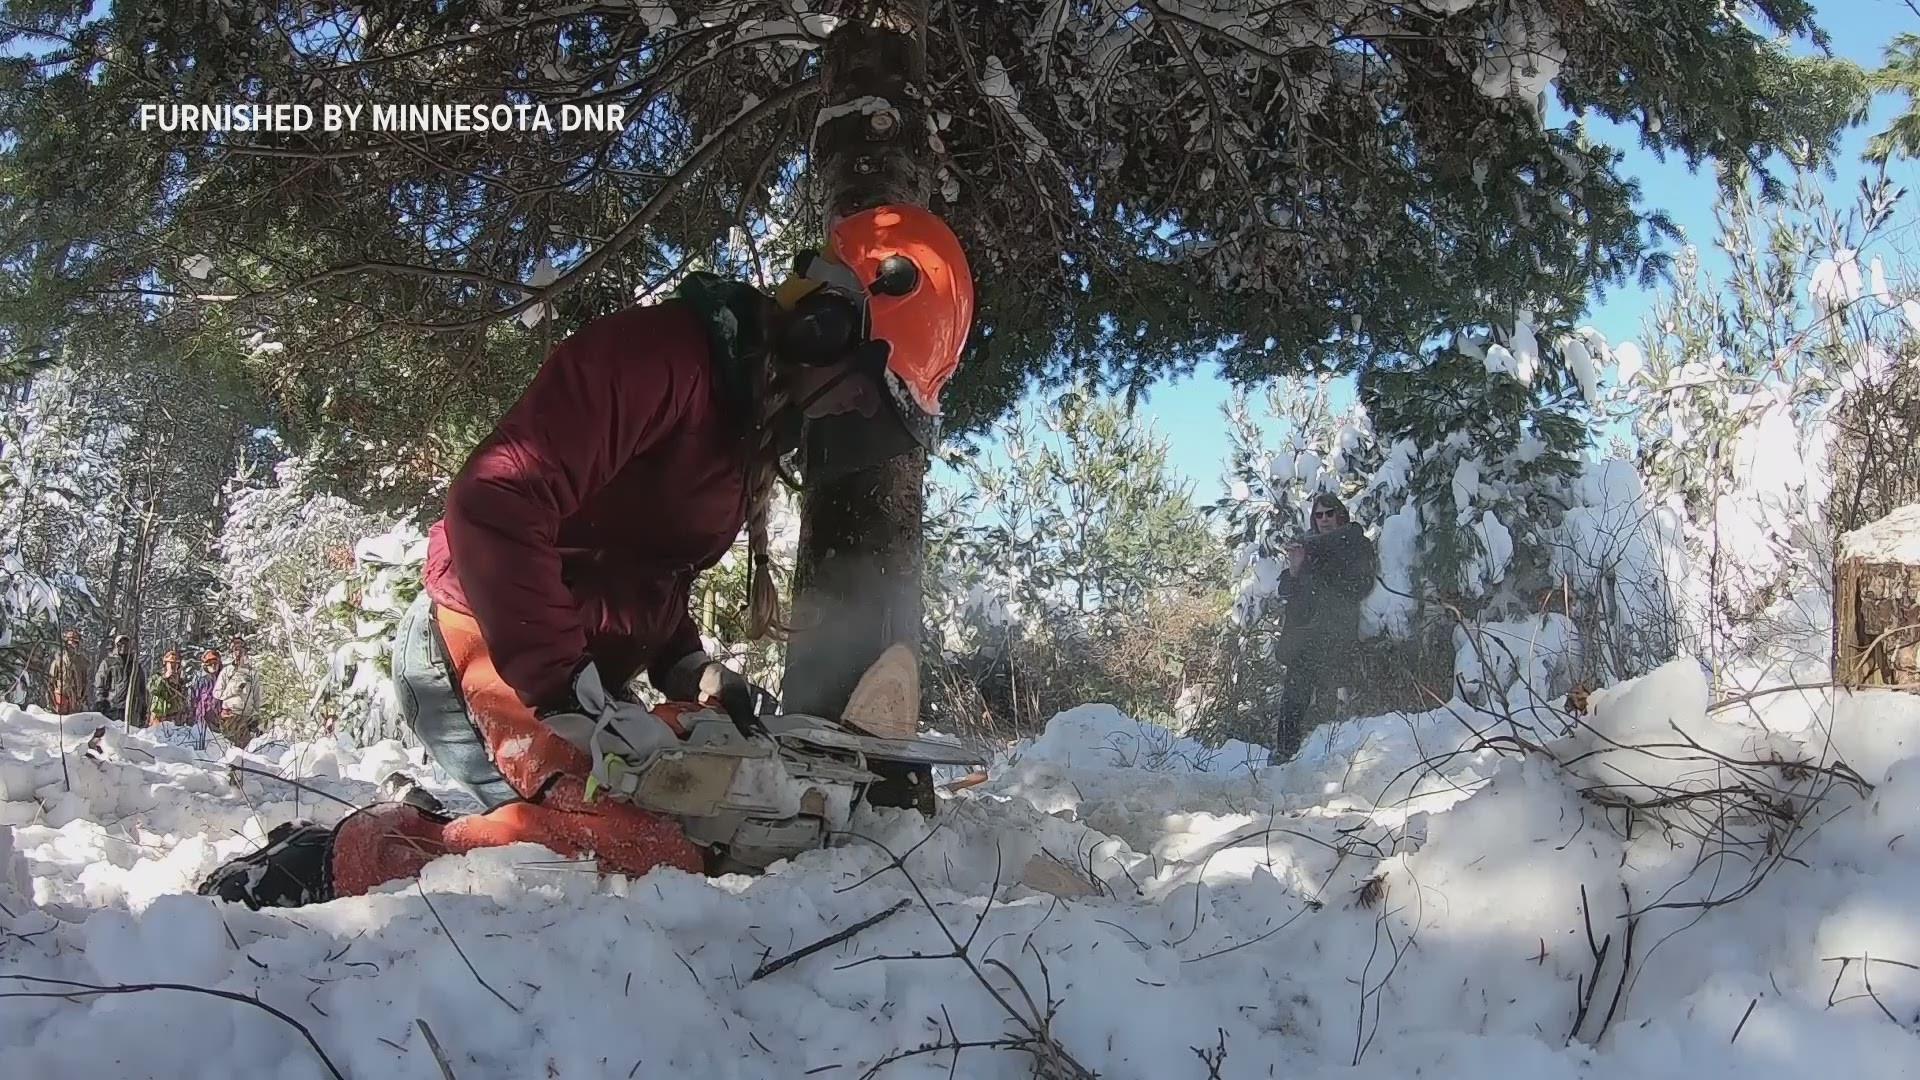 2020 Mn Christmas Tree Harvesting Governor's 2019 Christmas tree harvested in Pine Co. | kare11.com